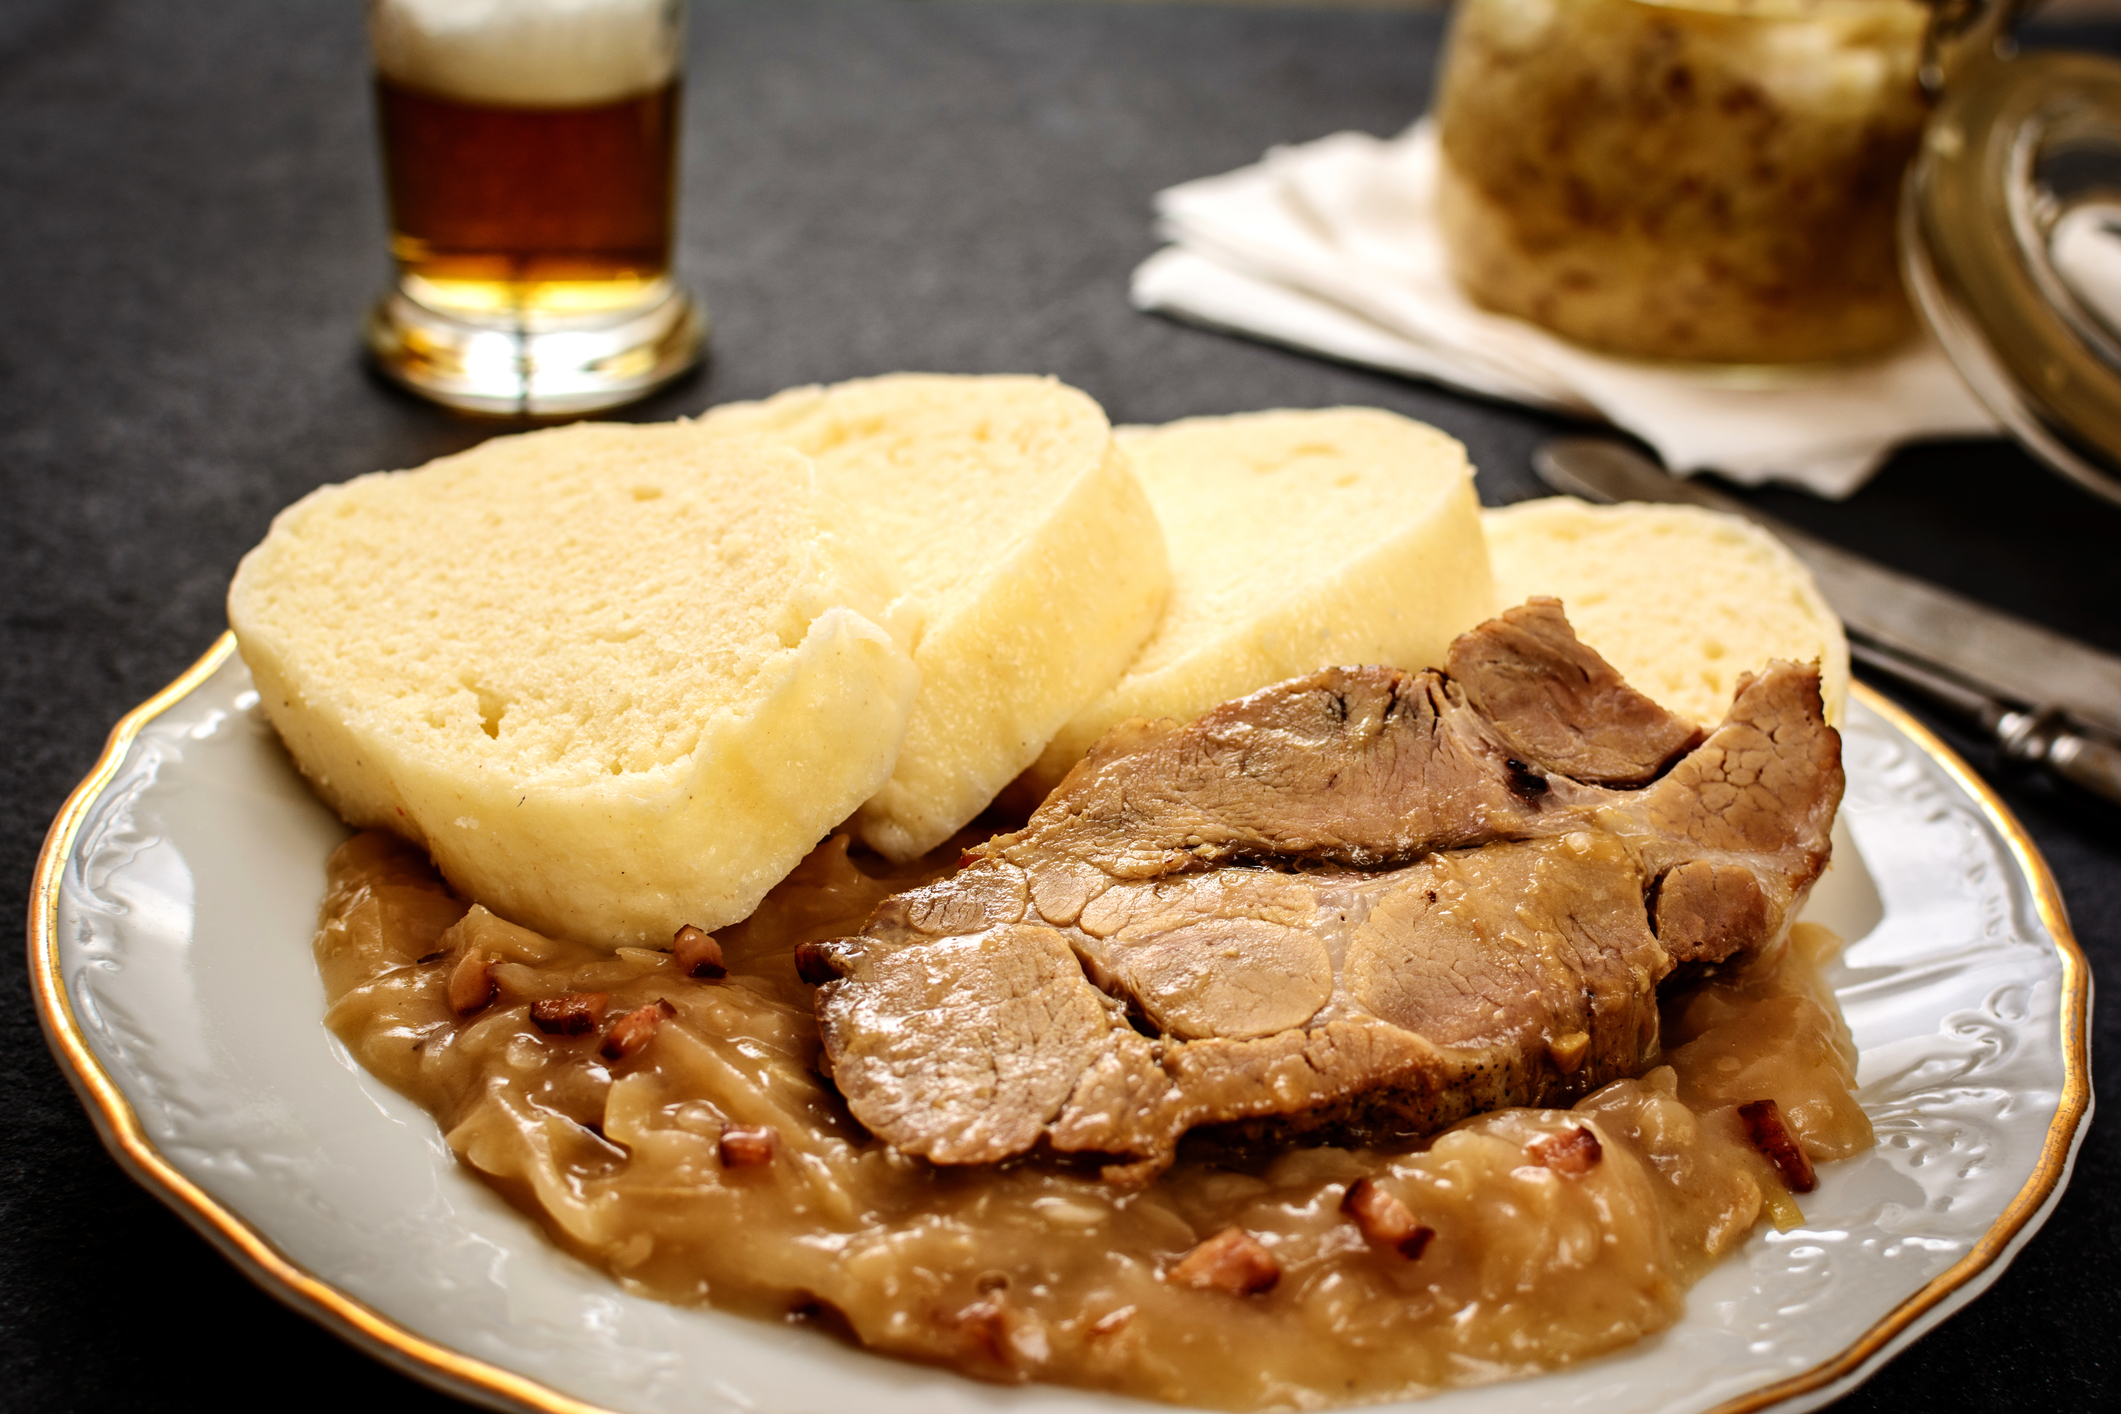 Veprova Pecene (Roasted Pork)